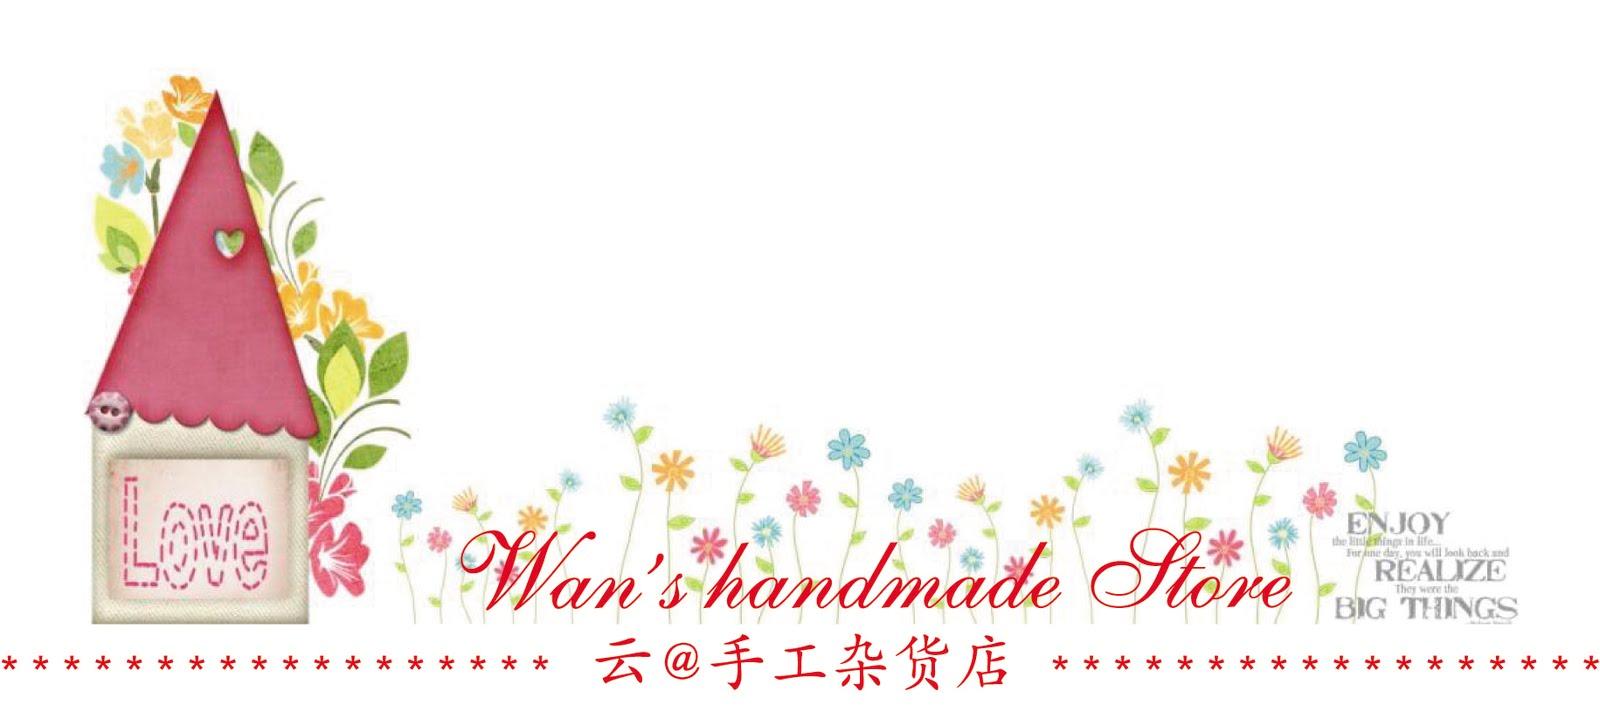 Wan's Handmade Store 云·手工杂货店